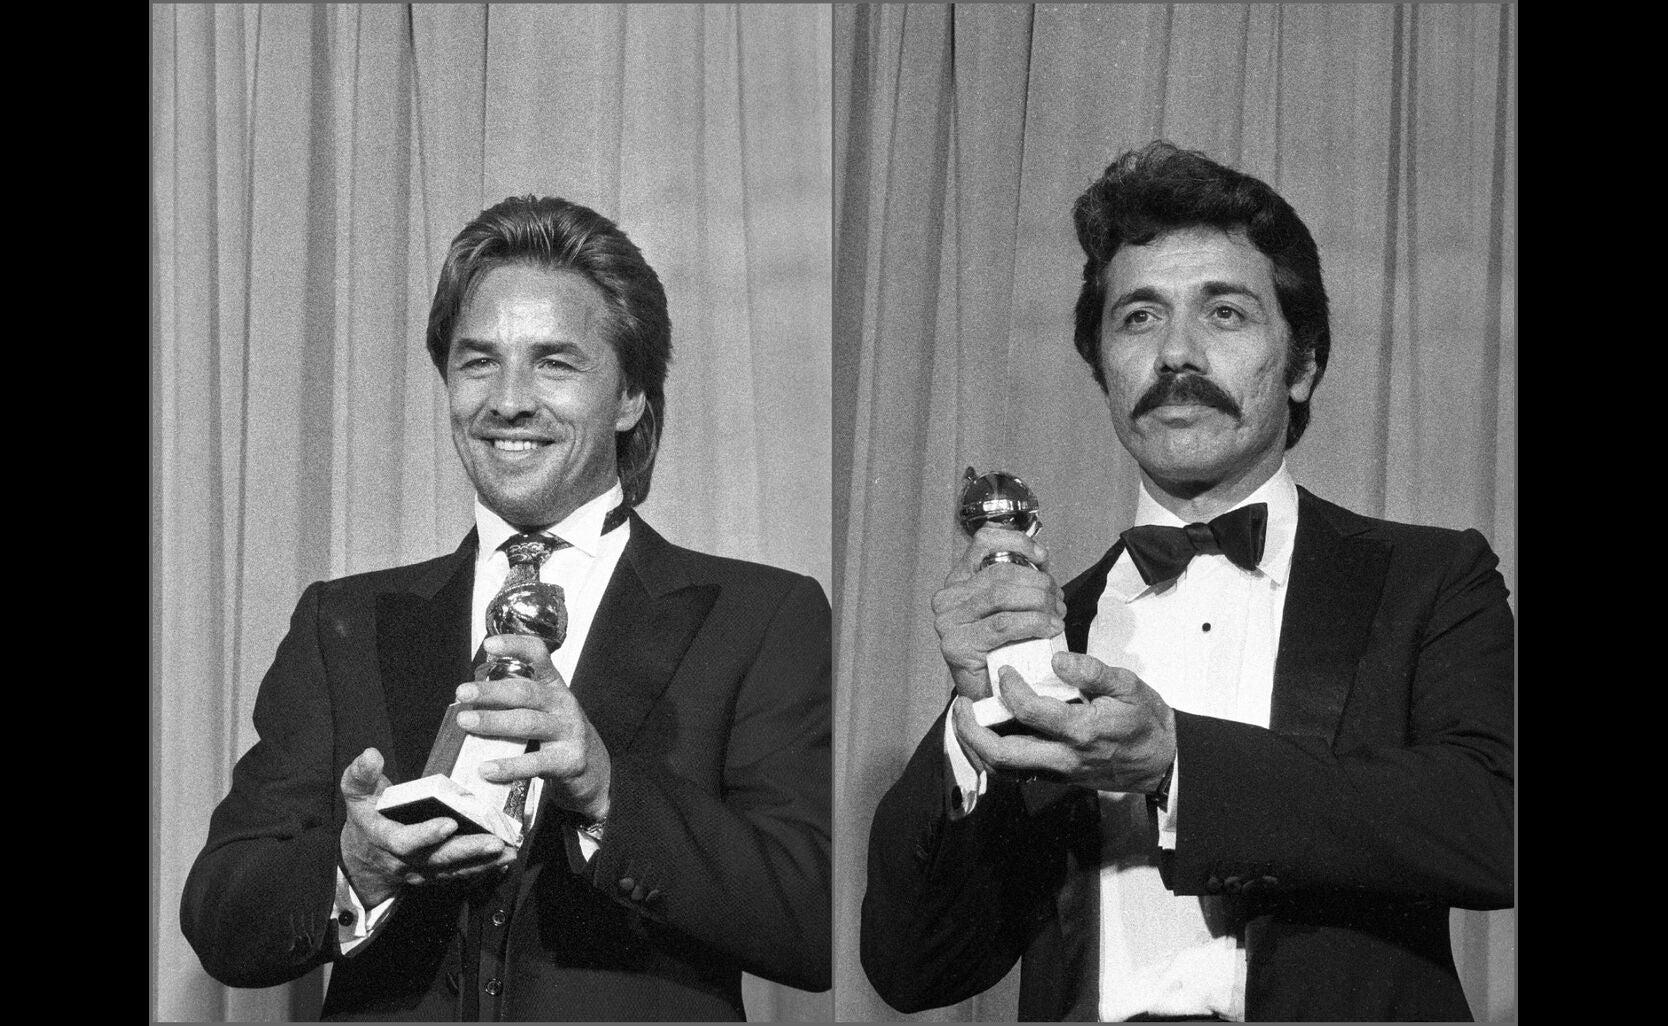 Miami Vice stars Don Johnson and Edward James Olmos